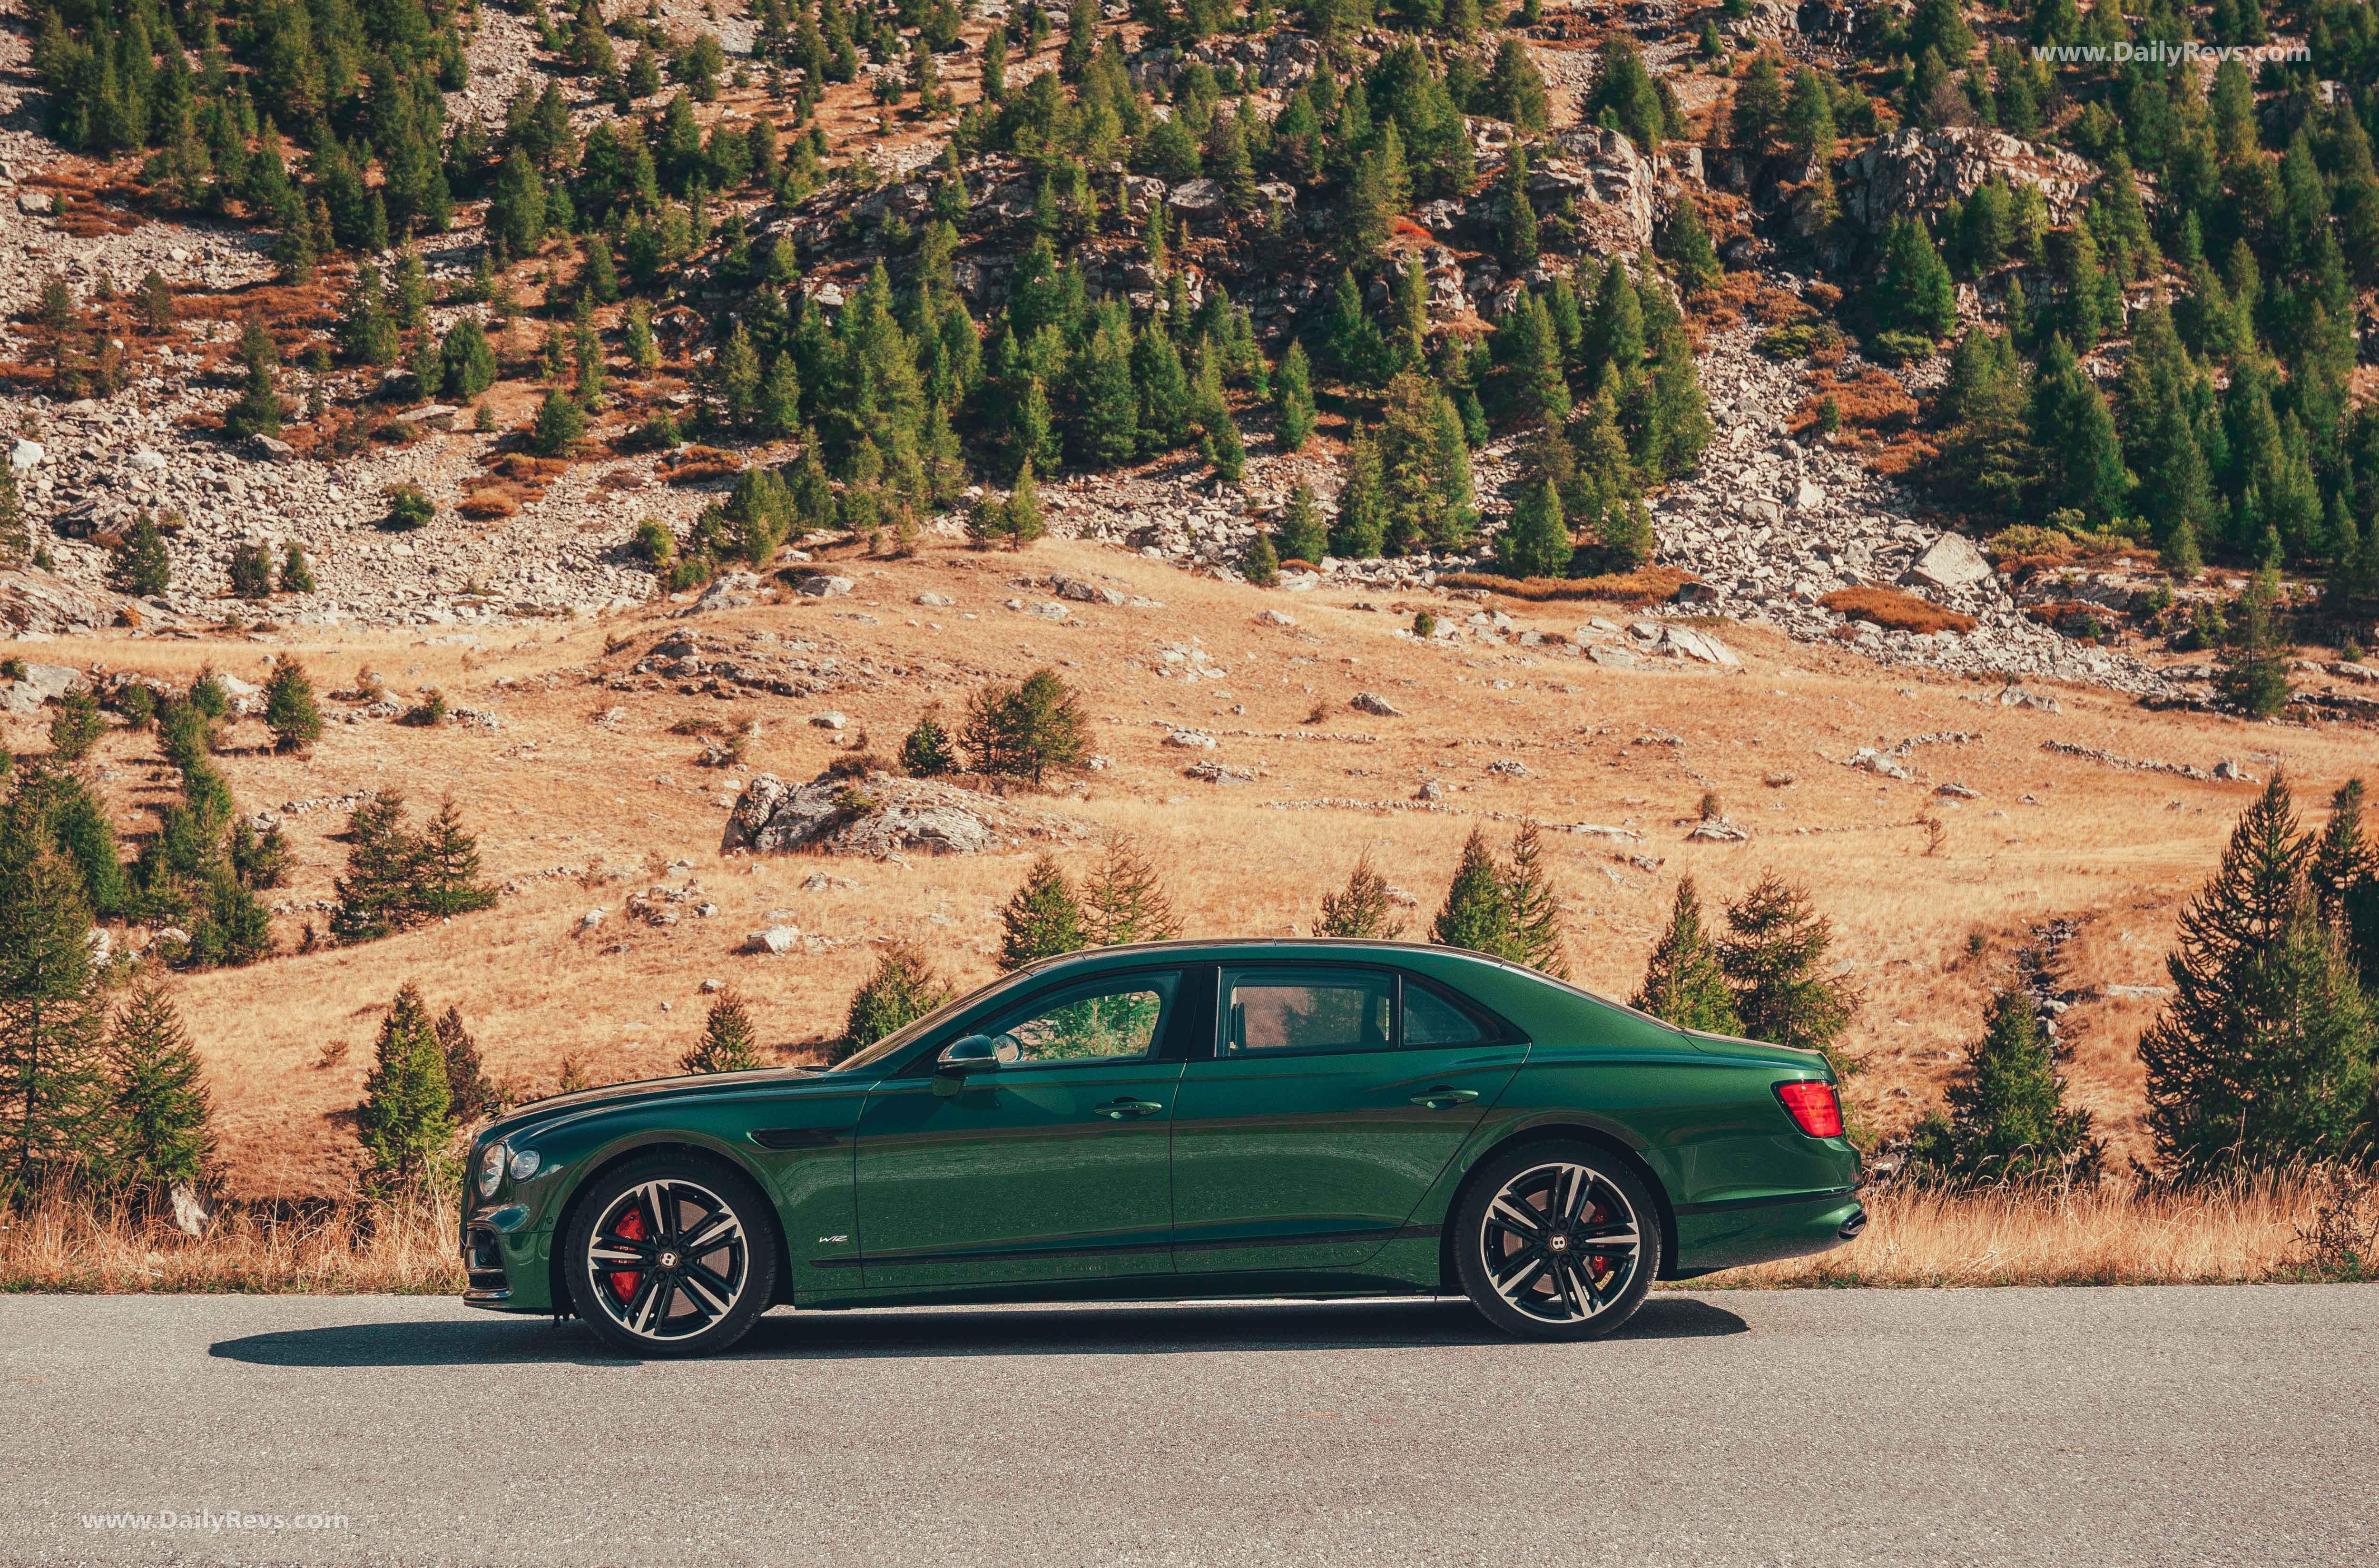 2020 Bentley Flying Spur full